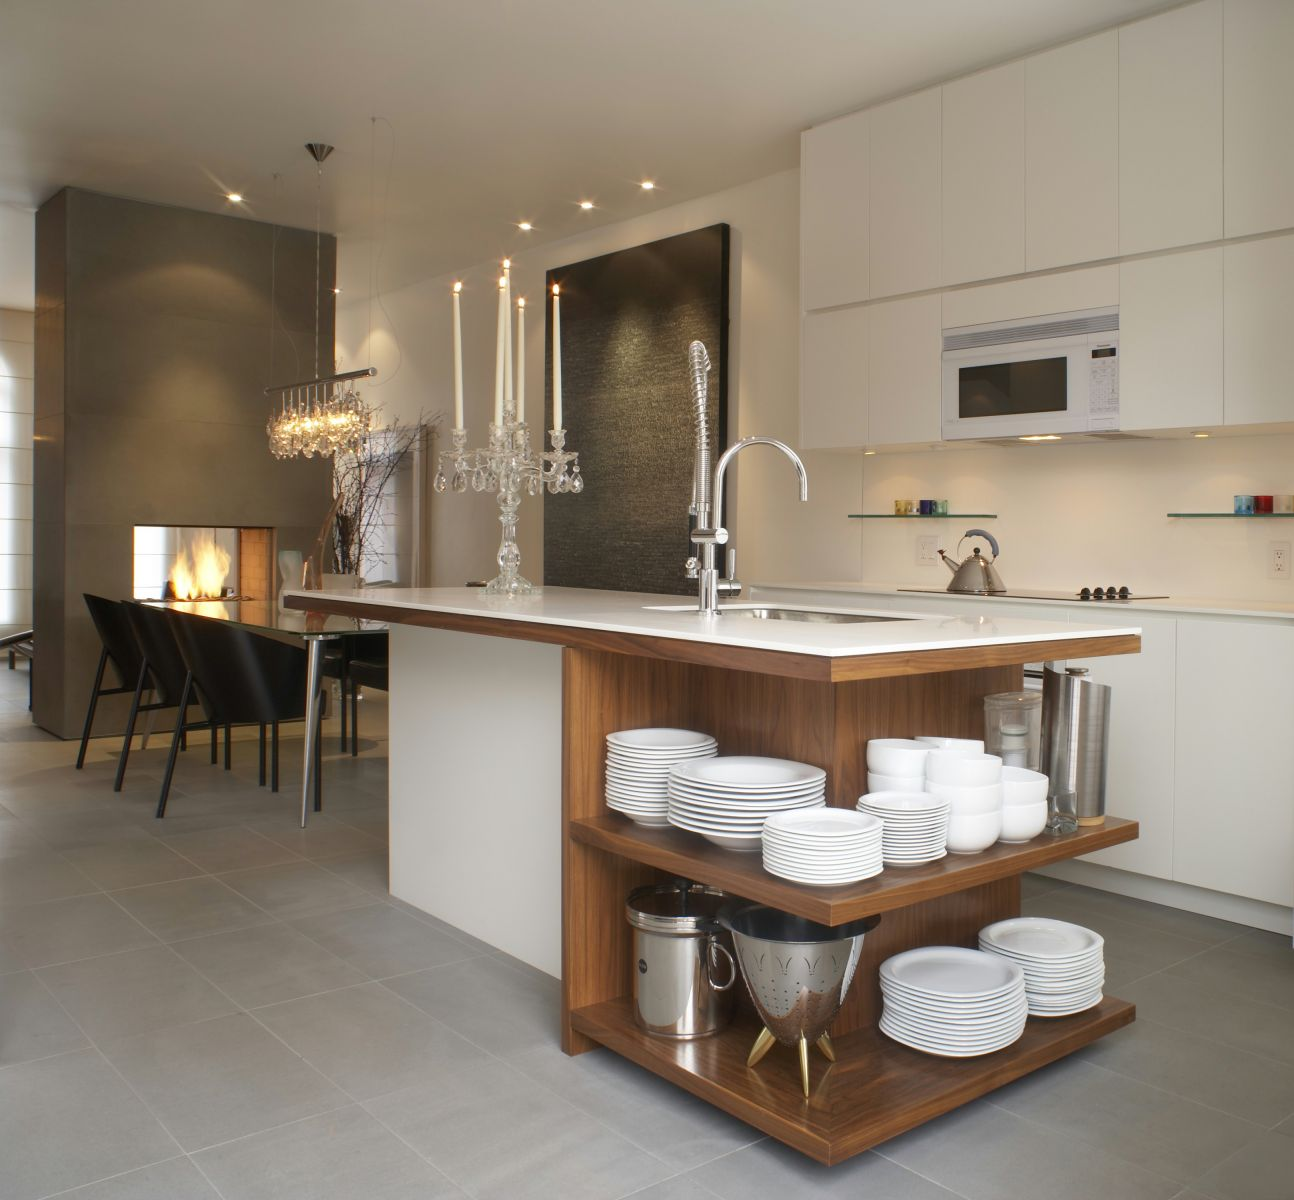 Cecconi simone project summerhill residence - Modern infill house cecconi simone ...